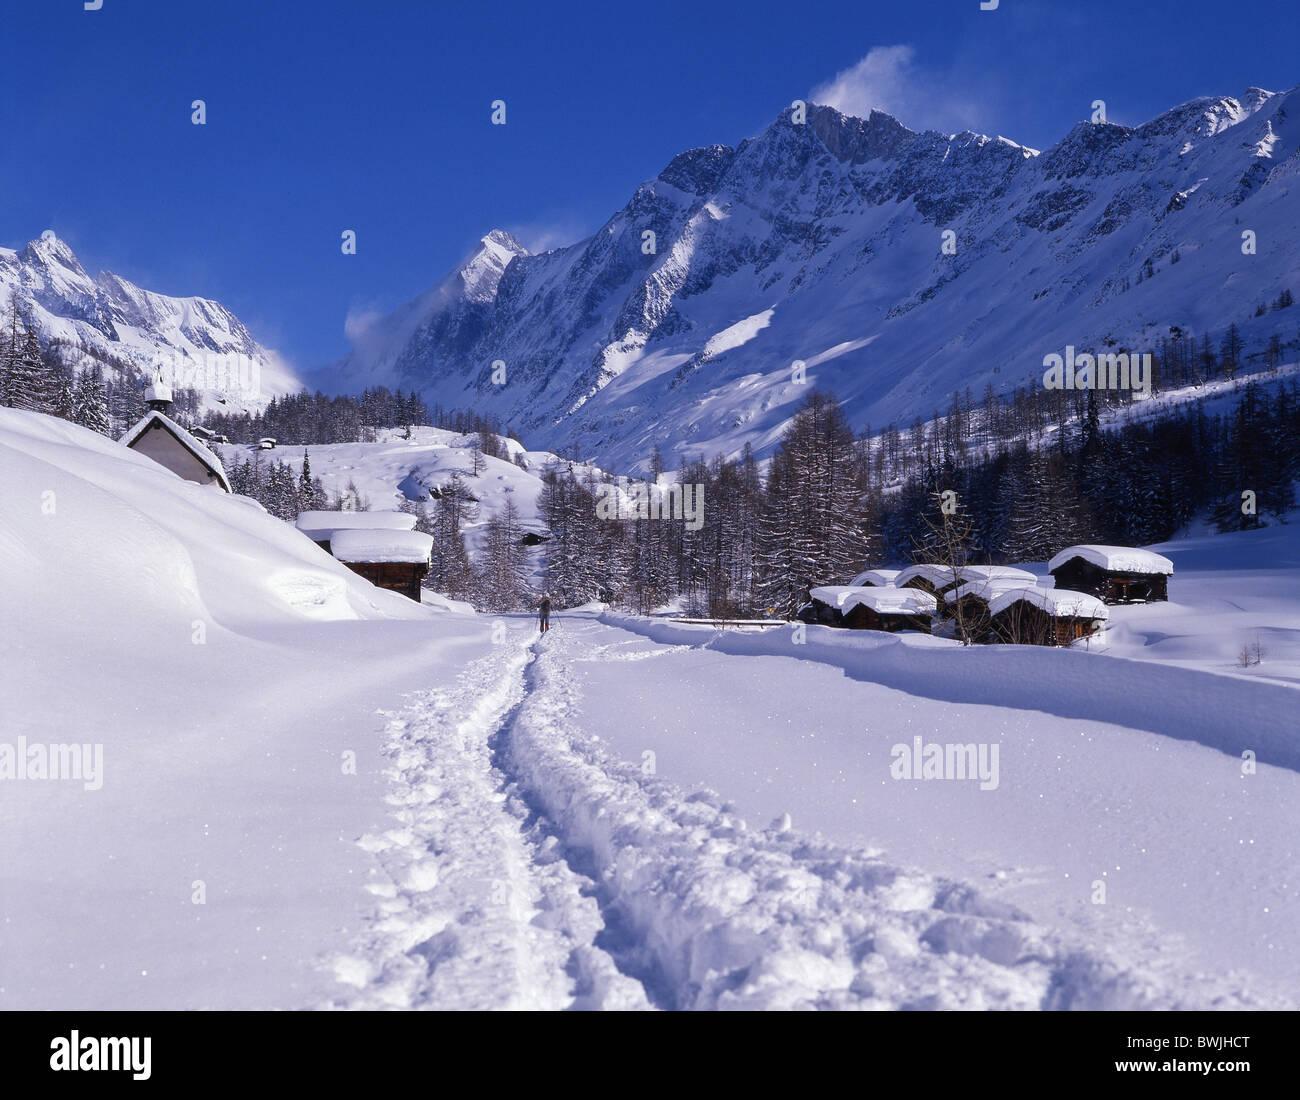 Lotschental hamlet Kuhmad settlement snowbound snow-covered snowy fresh snowfall snow footprints tracks trace - Stock Image